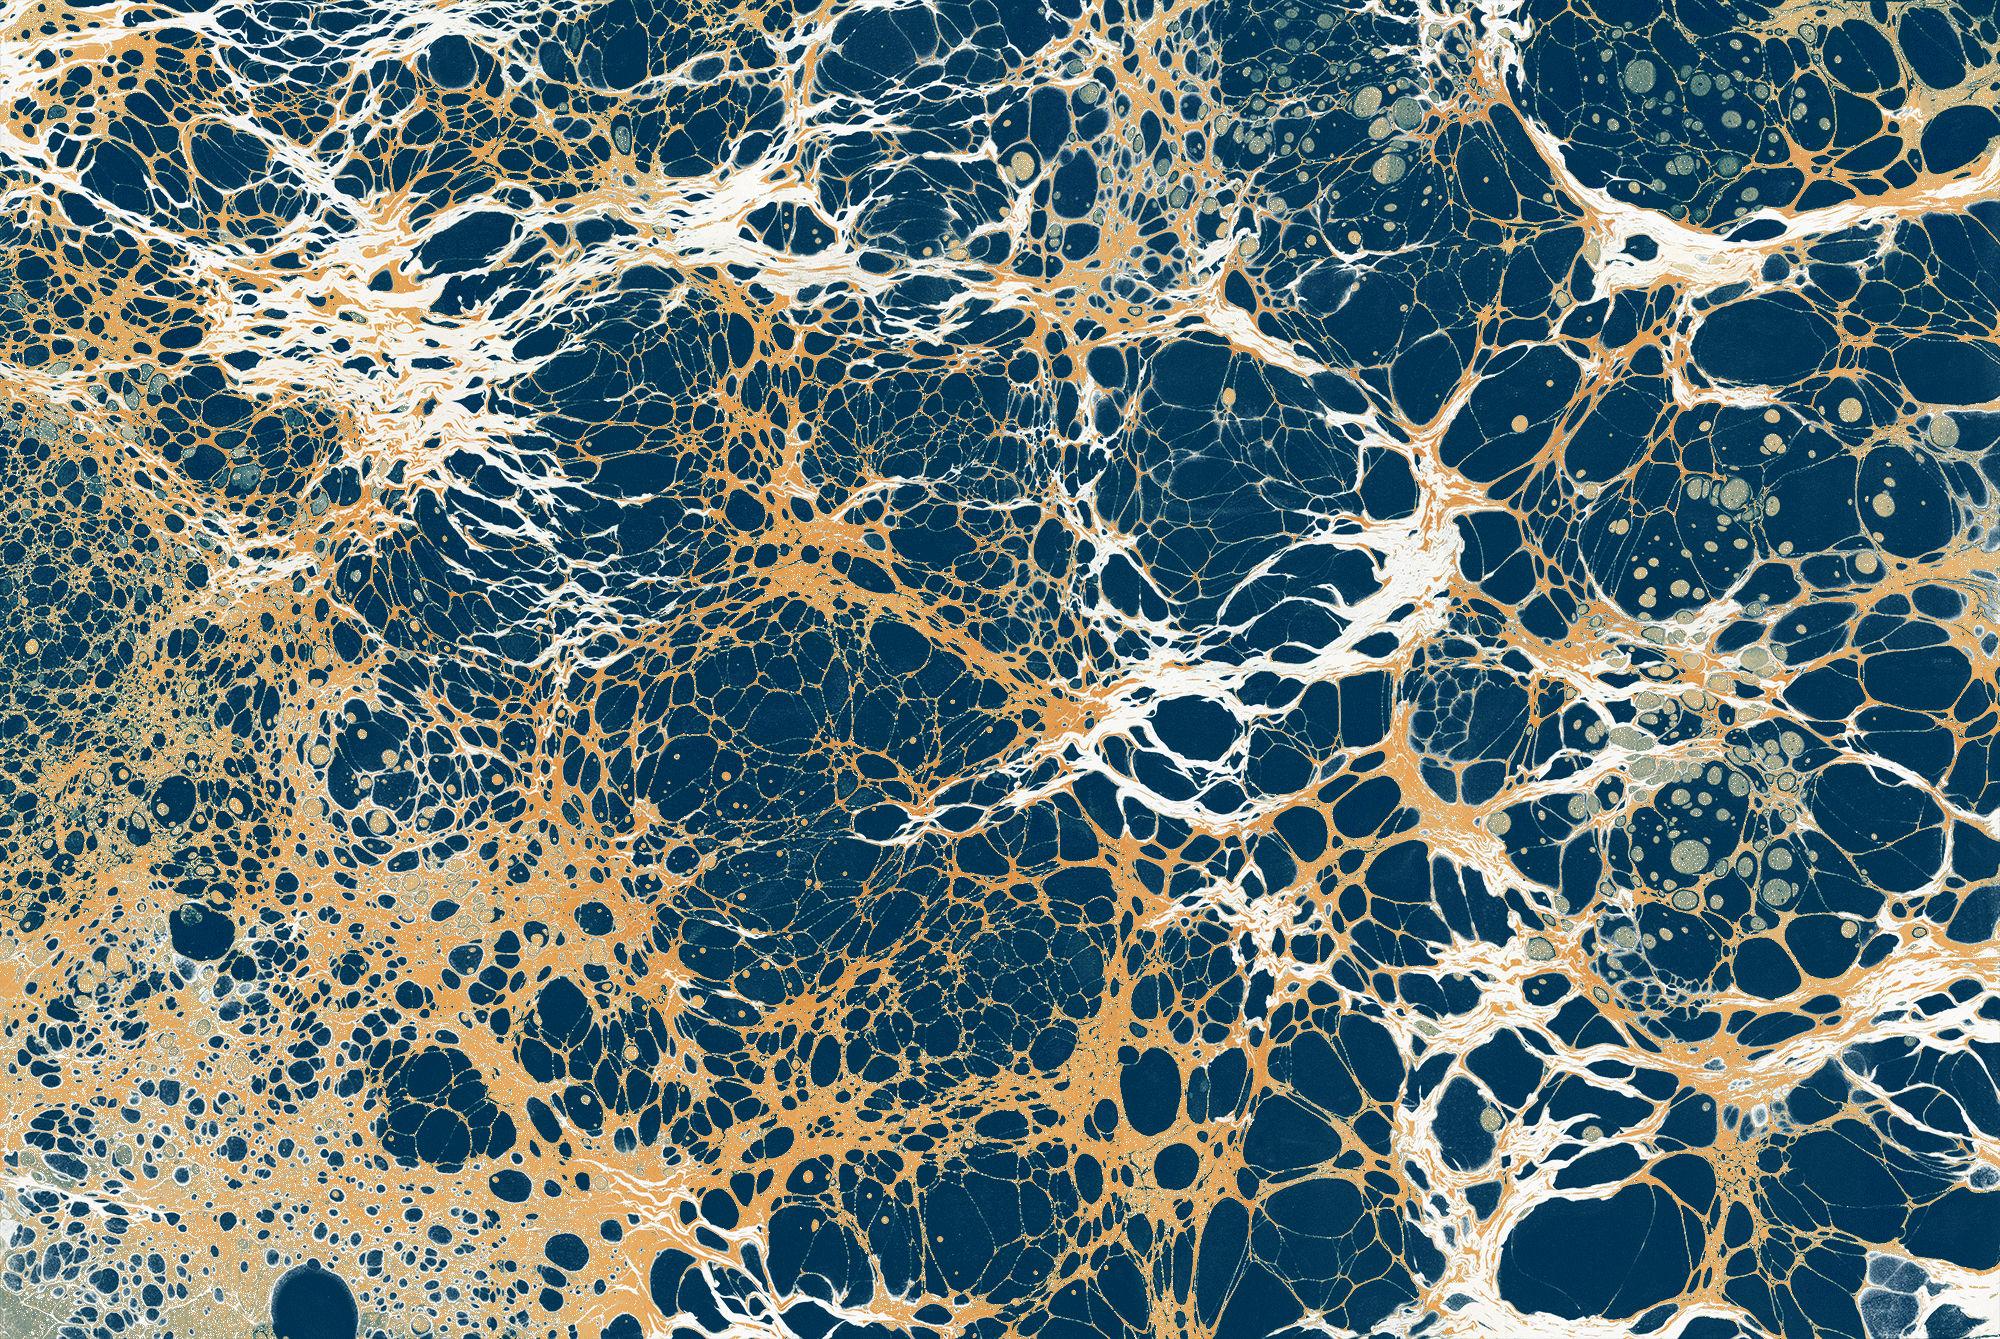 Download Wallpaper Patterned   Wallpaper Hd Wallpapers 2000x1339